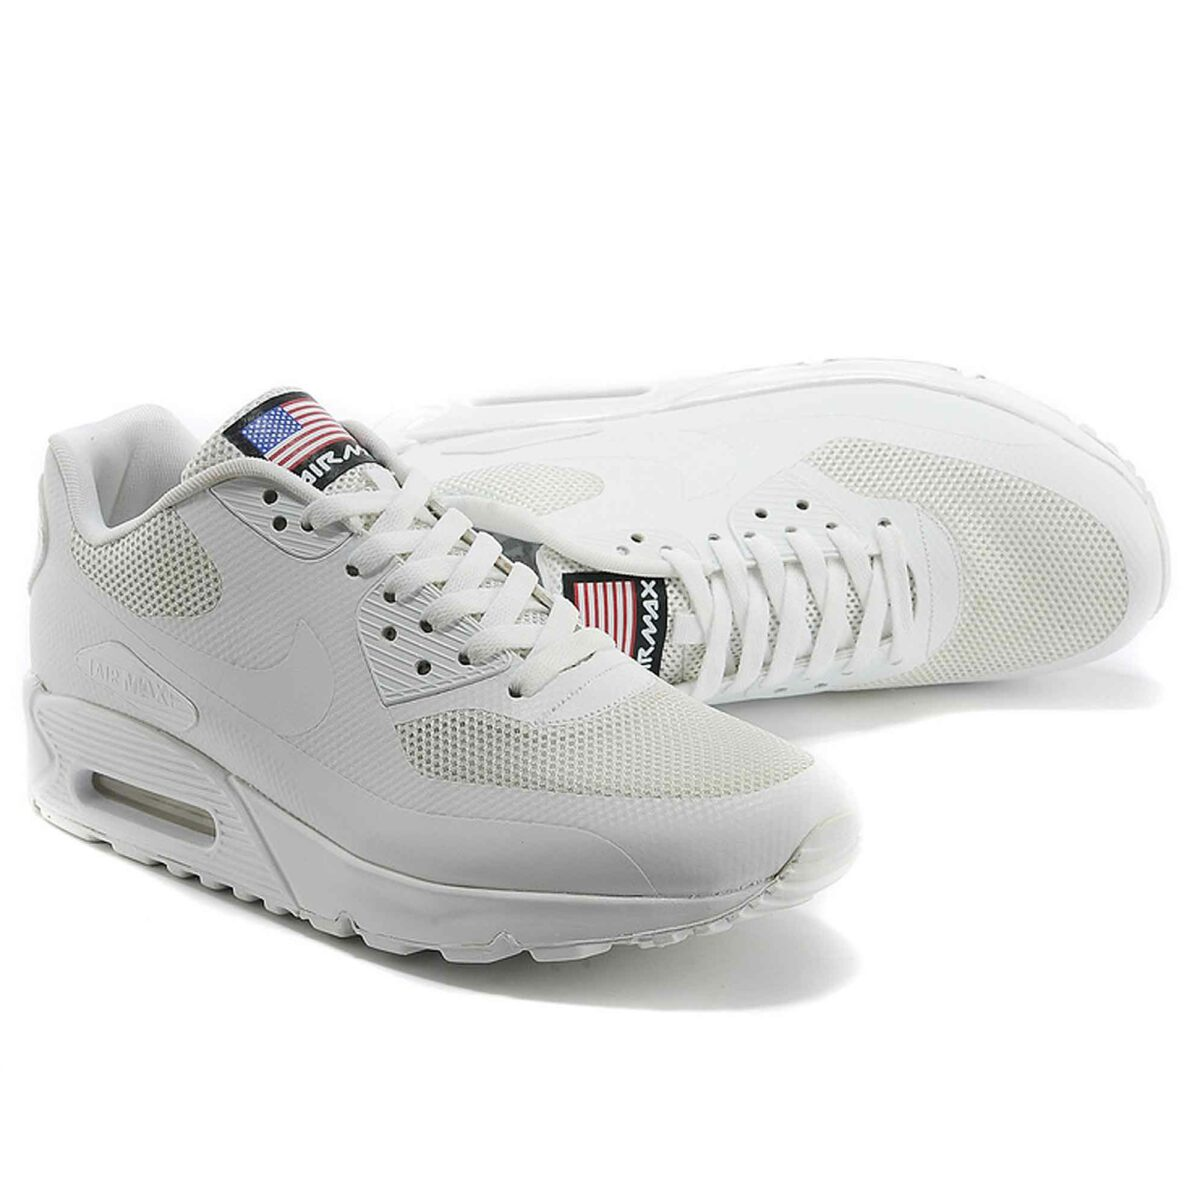 Купить Nike Air Max 90 Hyperfuse Independence Day 2013 White